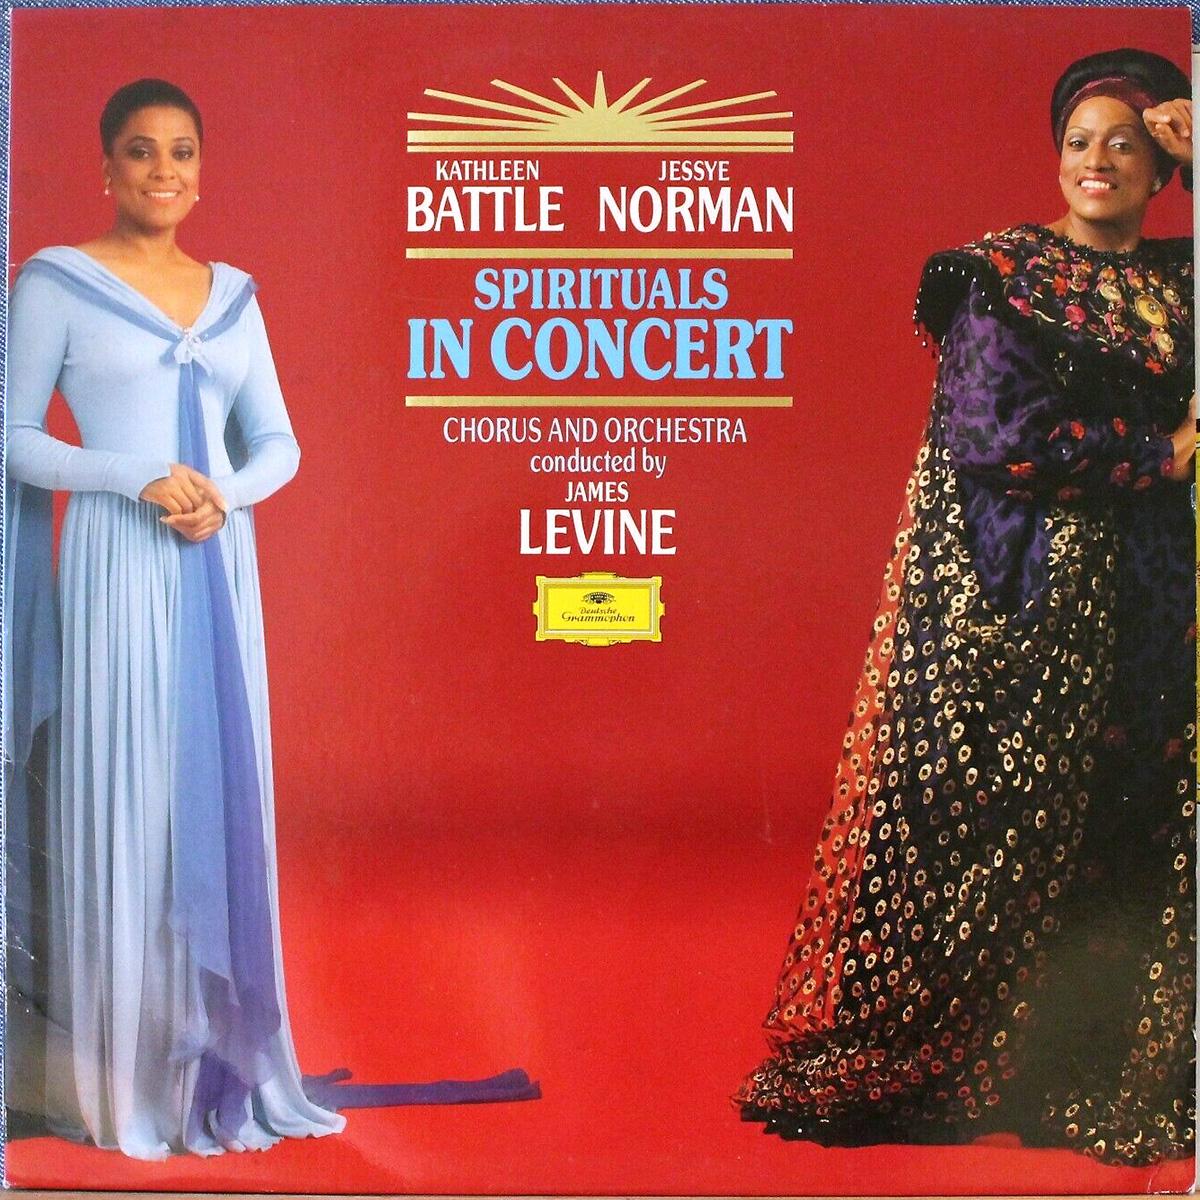 DGG 429 798 Spirituals In Concert Kathleen Battle Jessye Norman Levine DGG Digital Aufnahme